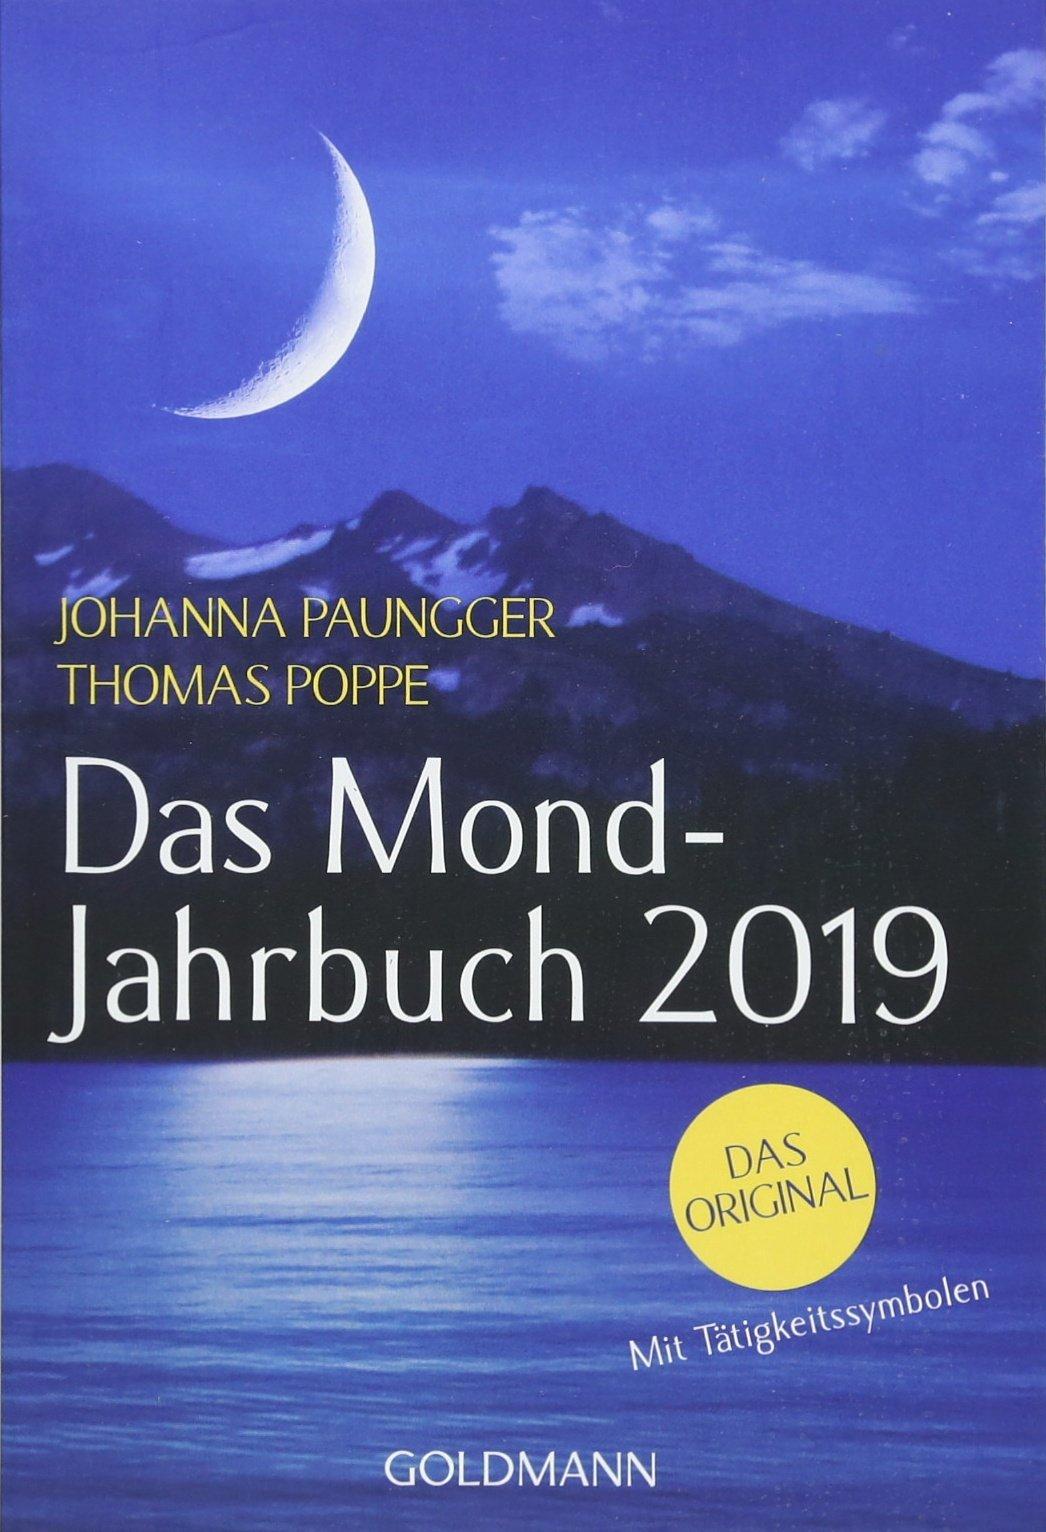 Das Mond-Jahrbuch 2019 Taschenbuch – 16. April 2018 Johanna Paungger Thomas Poppe Goldmann Verlag 3442177405